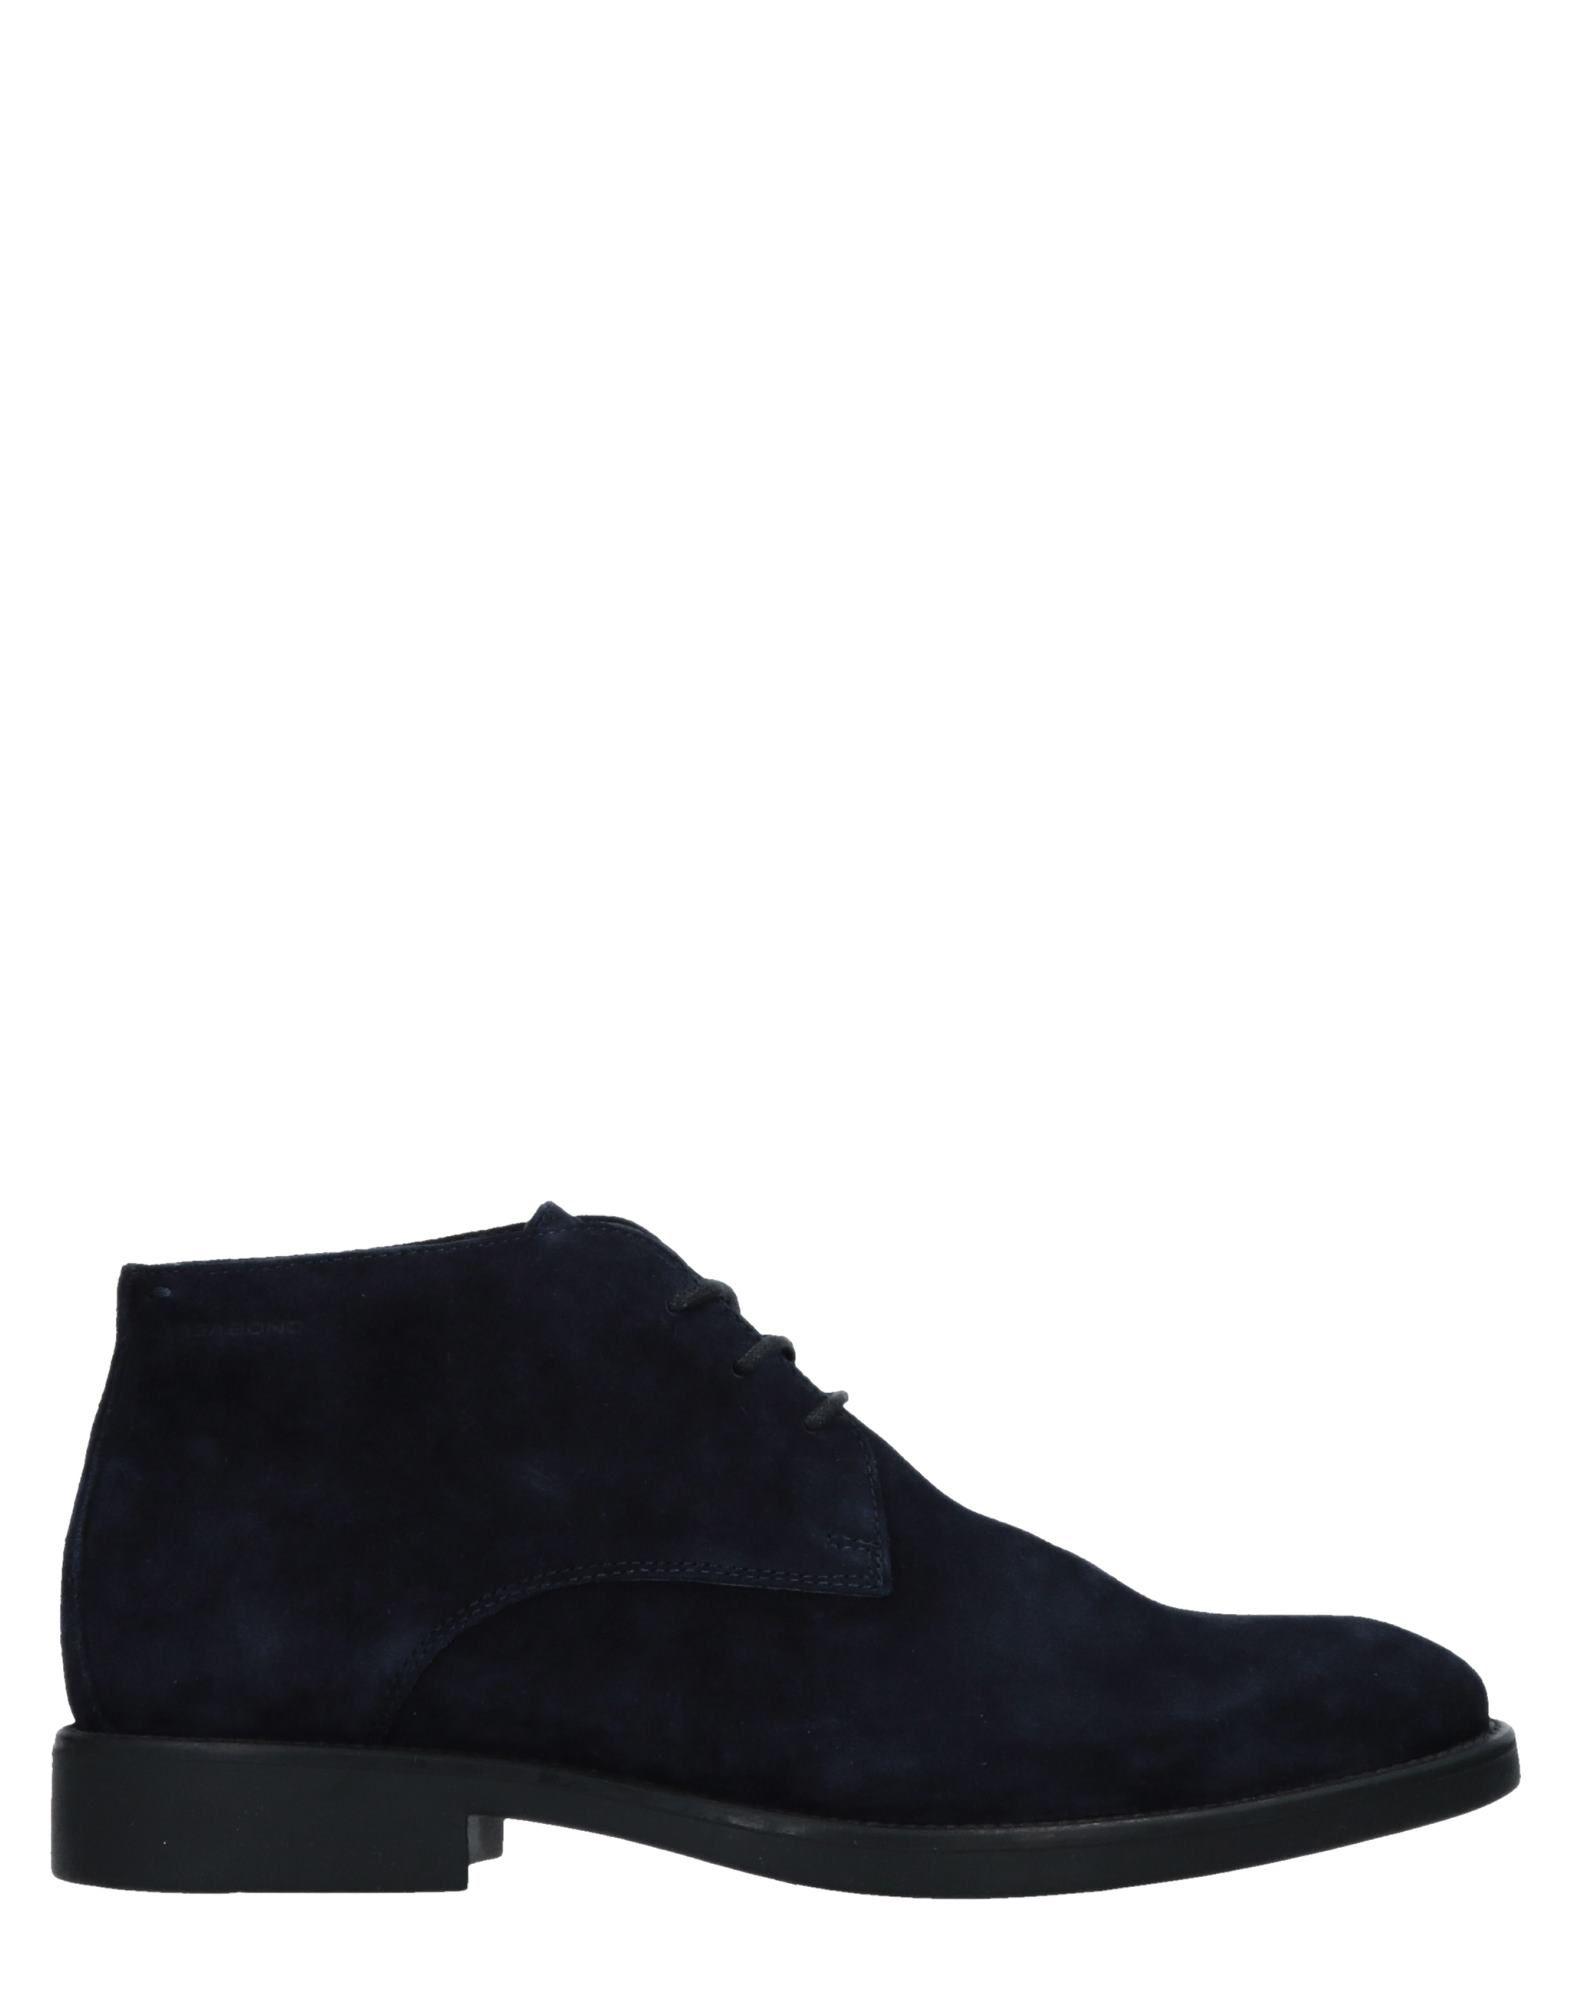 Stivaletti Vagabond Shoemakers Uomo Uomo Shoemakers - 11512956ES 3ce4cf